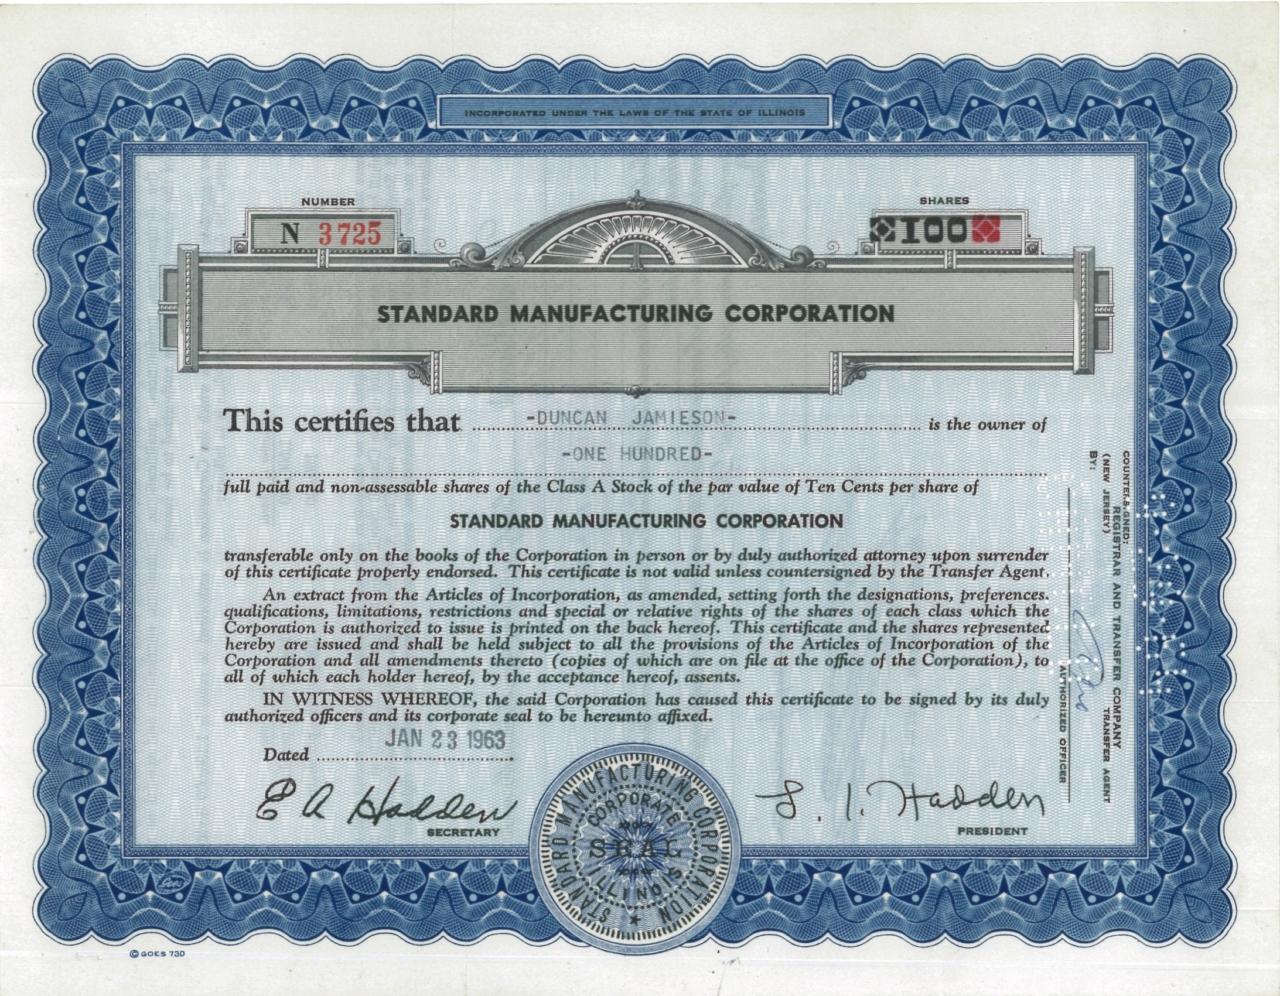 Standard Manufacturing Corporation